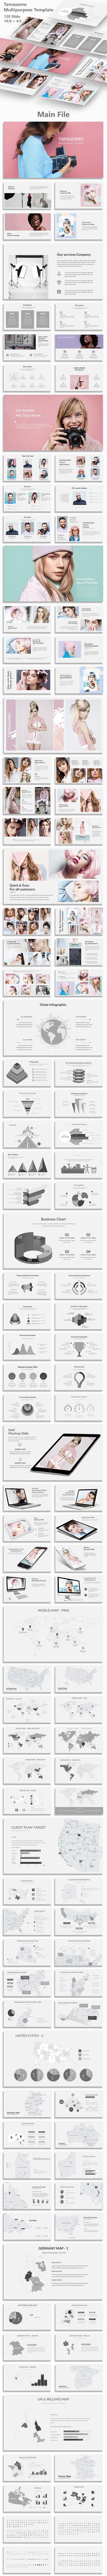 Tamazamo Multipurpose PowerPoint Template - Creative PowerPoint Templates